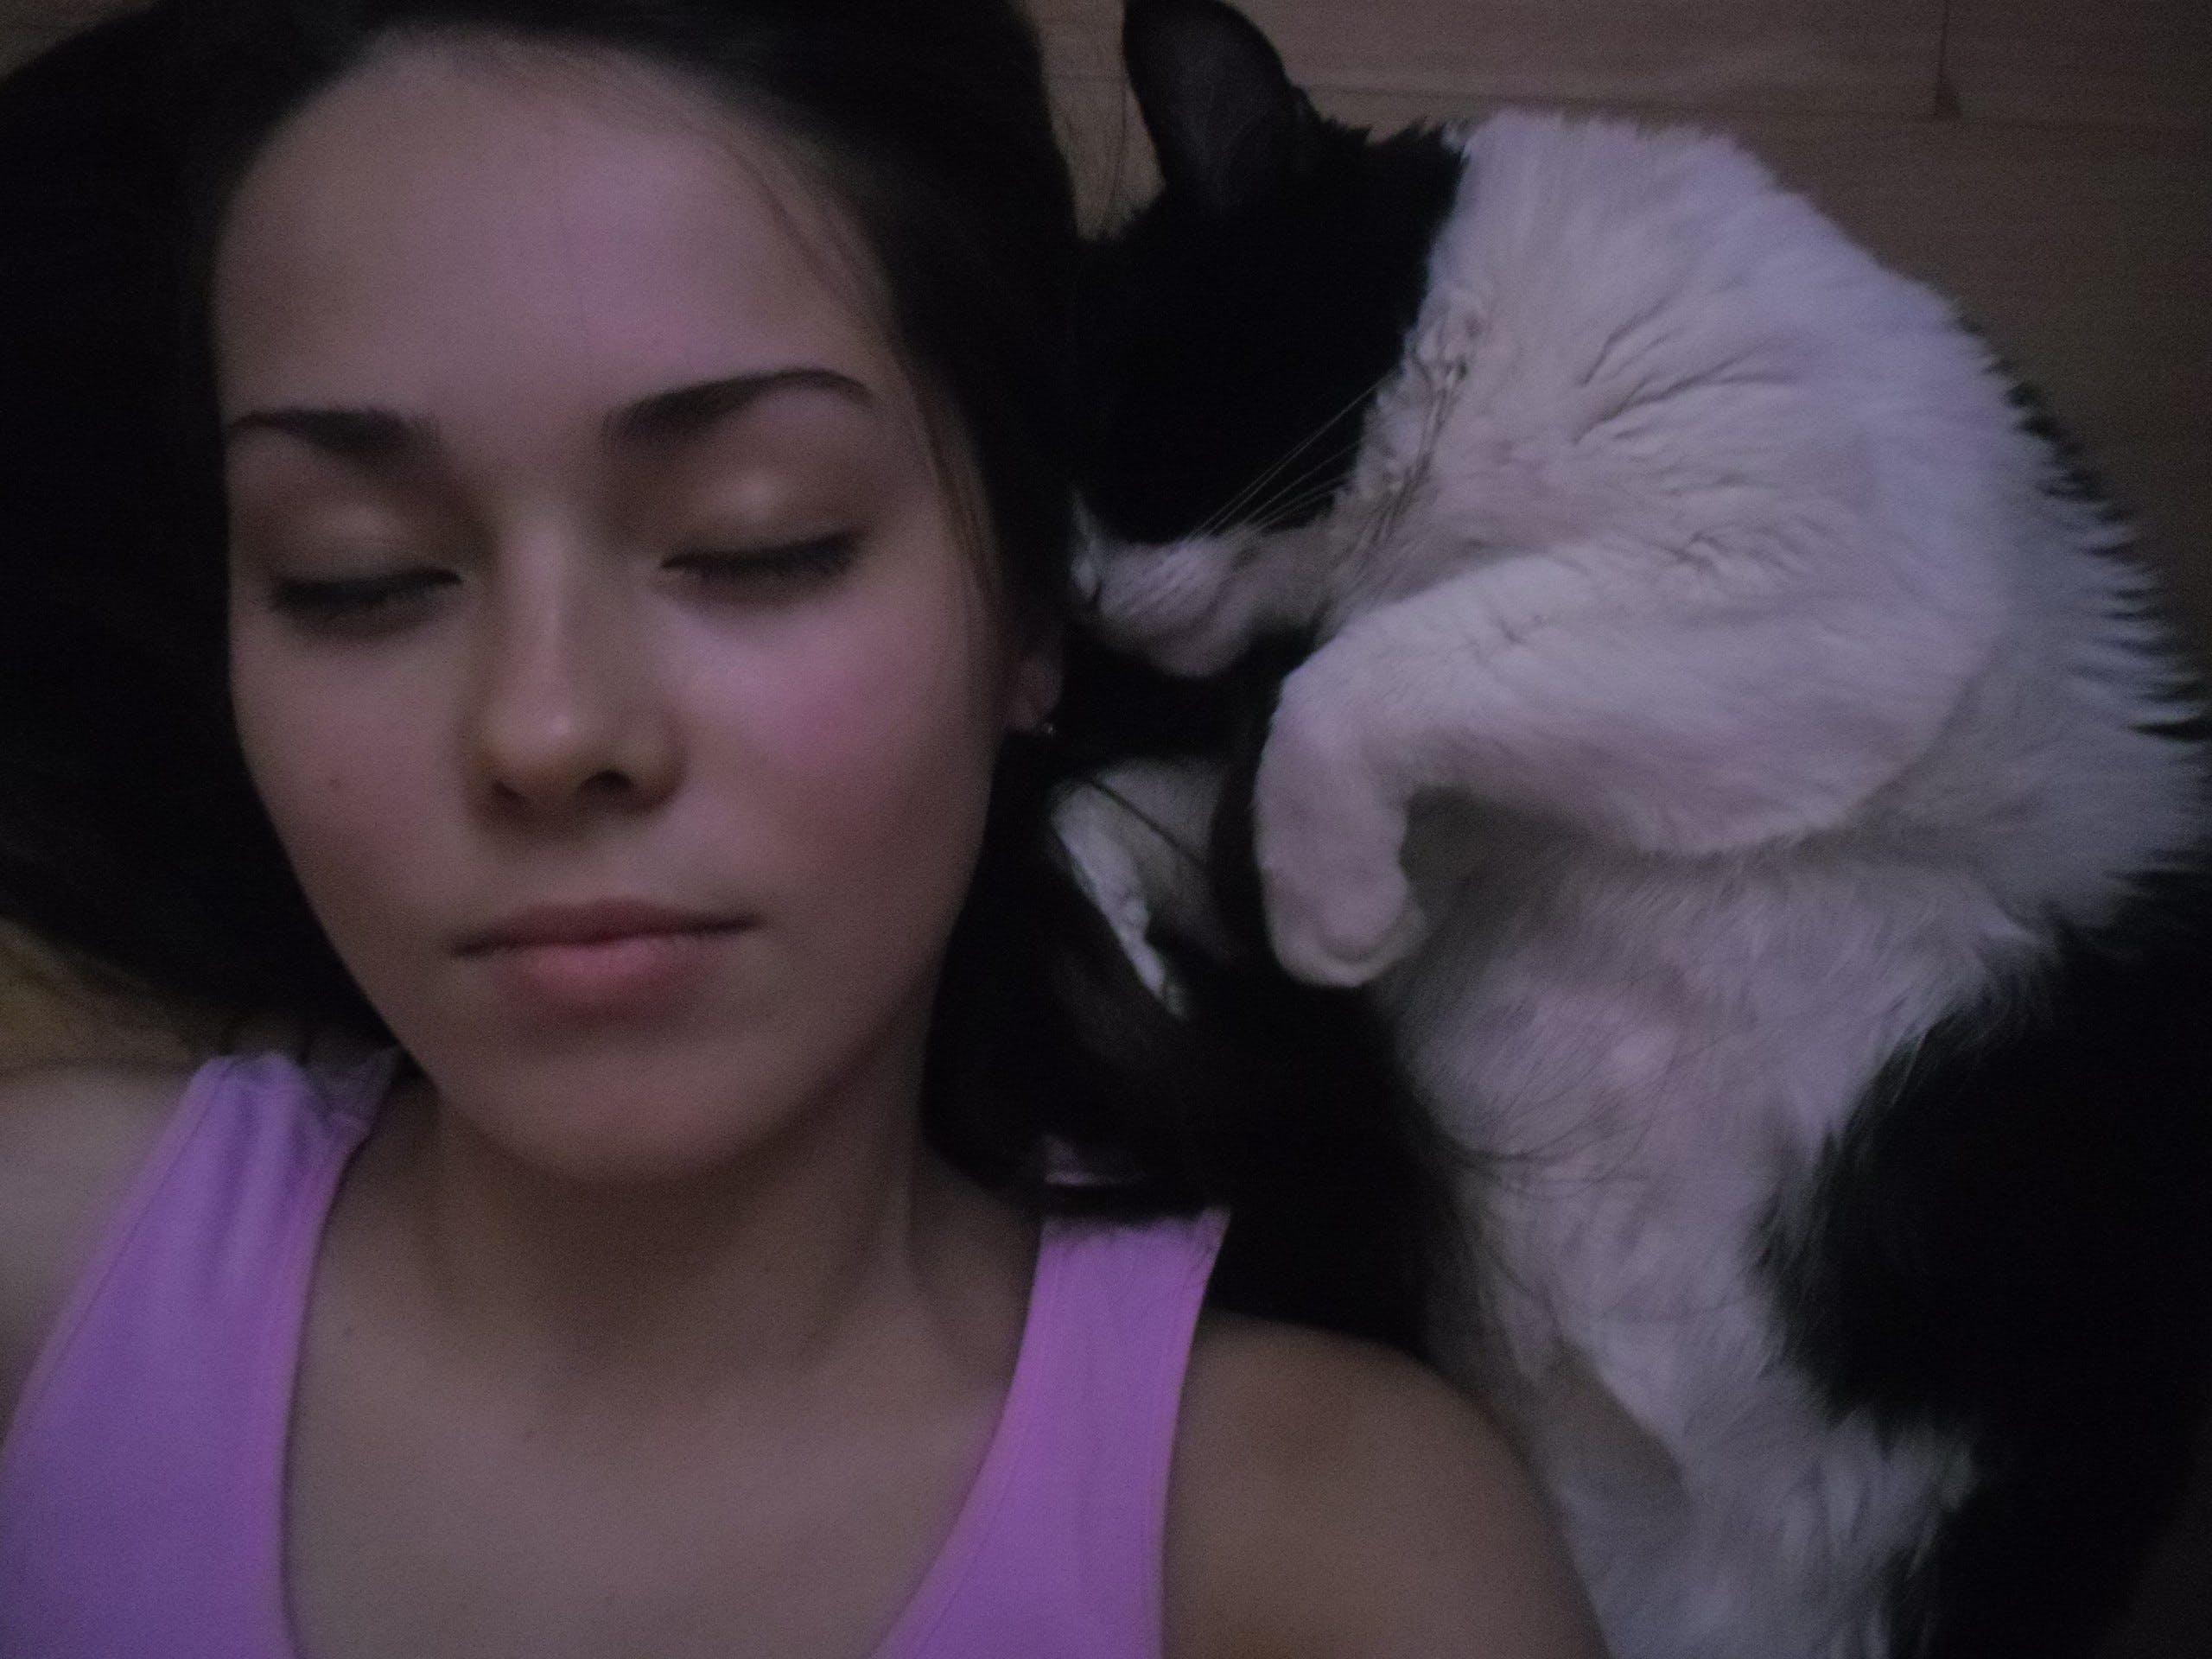 Free stock photo of #cute #female #cat #sleep #friends, #lady #eyes #woman, #peace #silence, #photoshoot